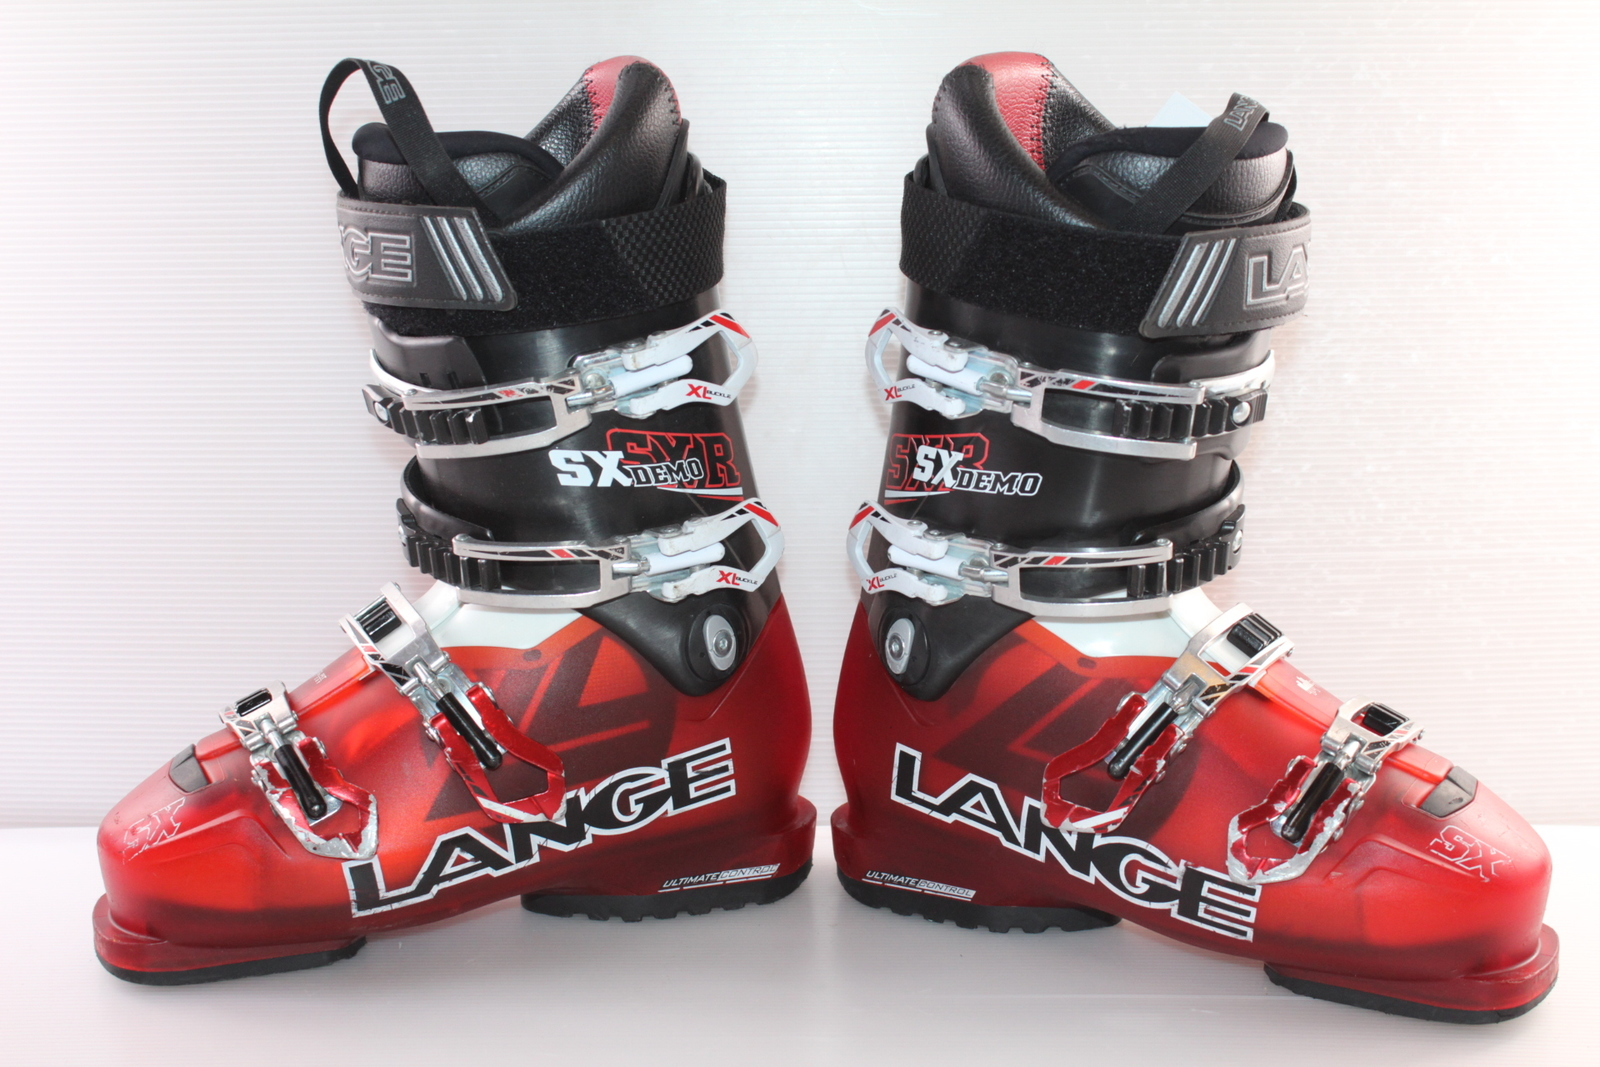 Lyžařské boty Lange SXR Demo vel. EU38.5 flexe 80